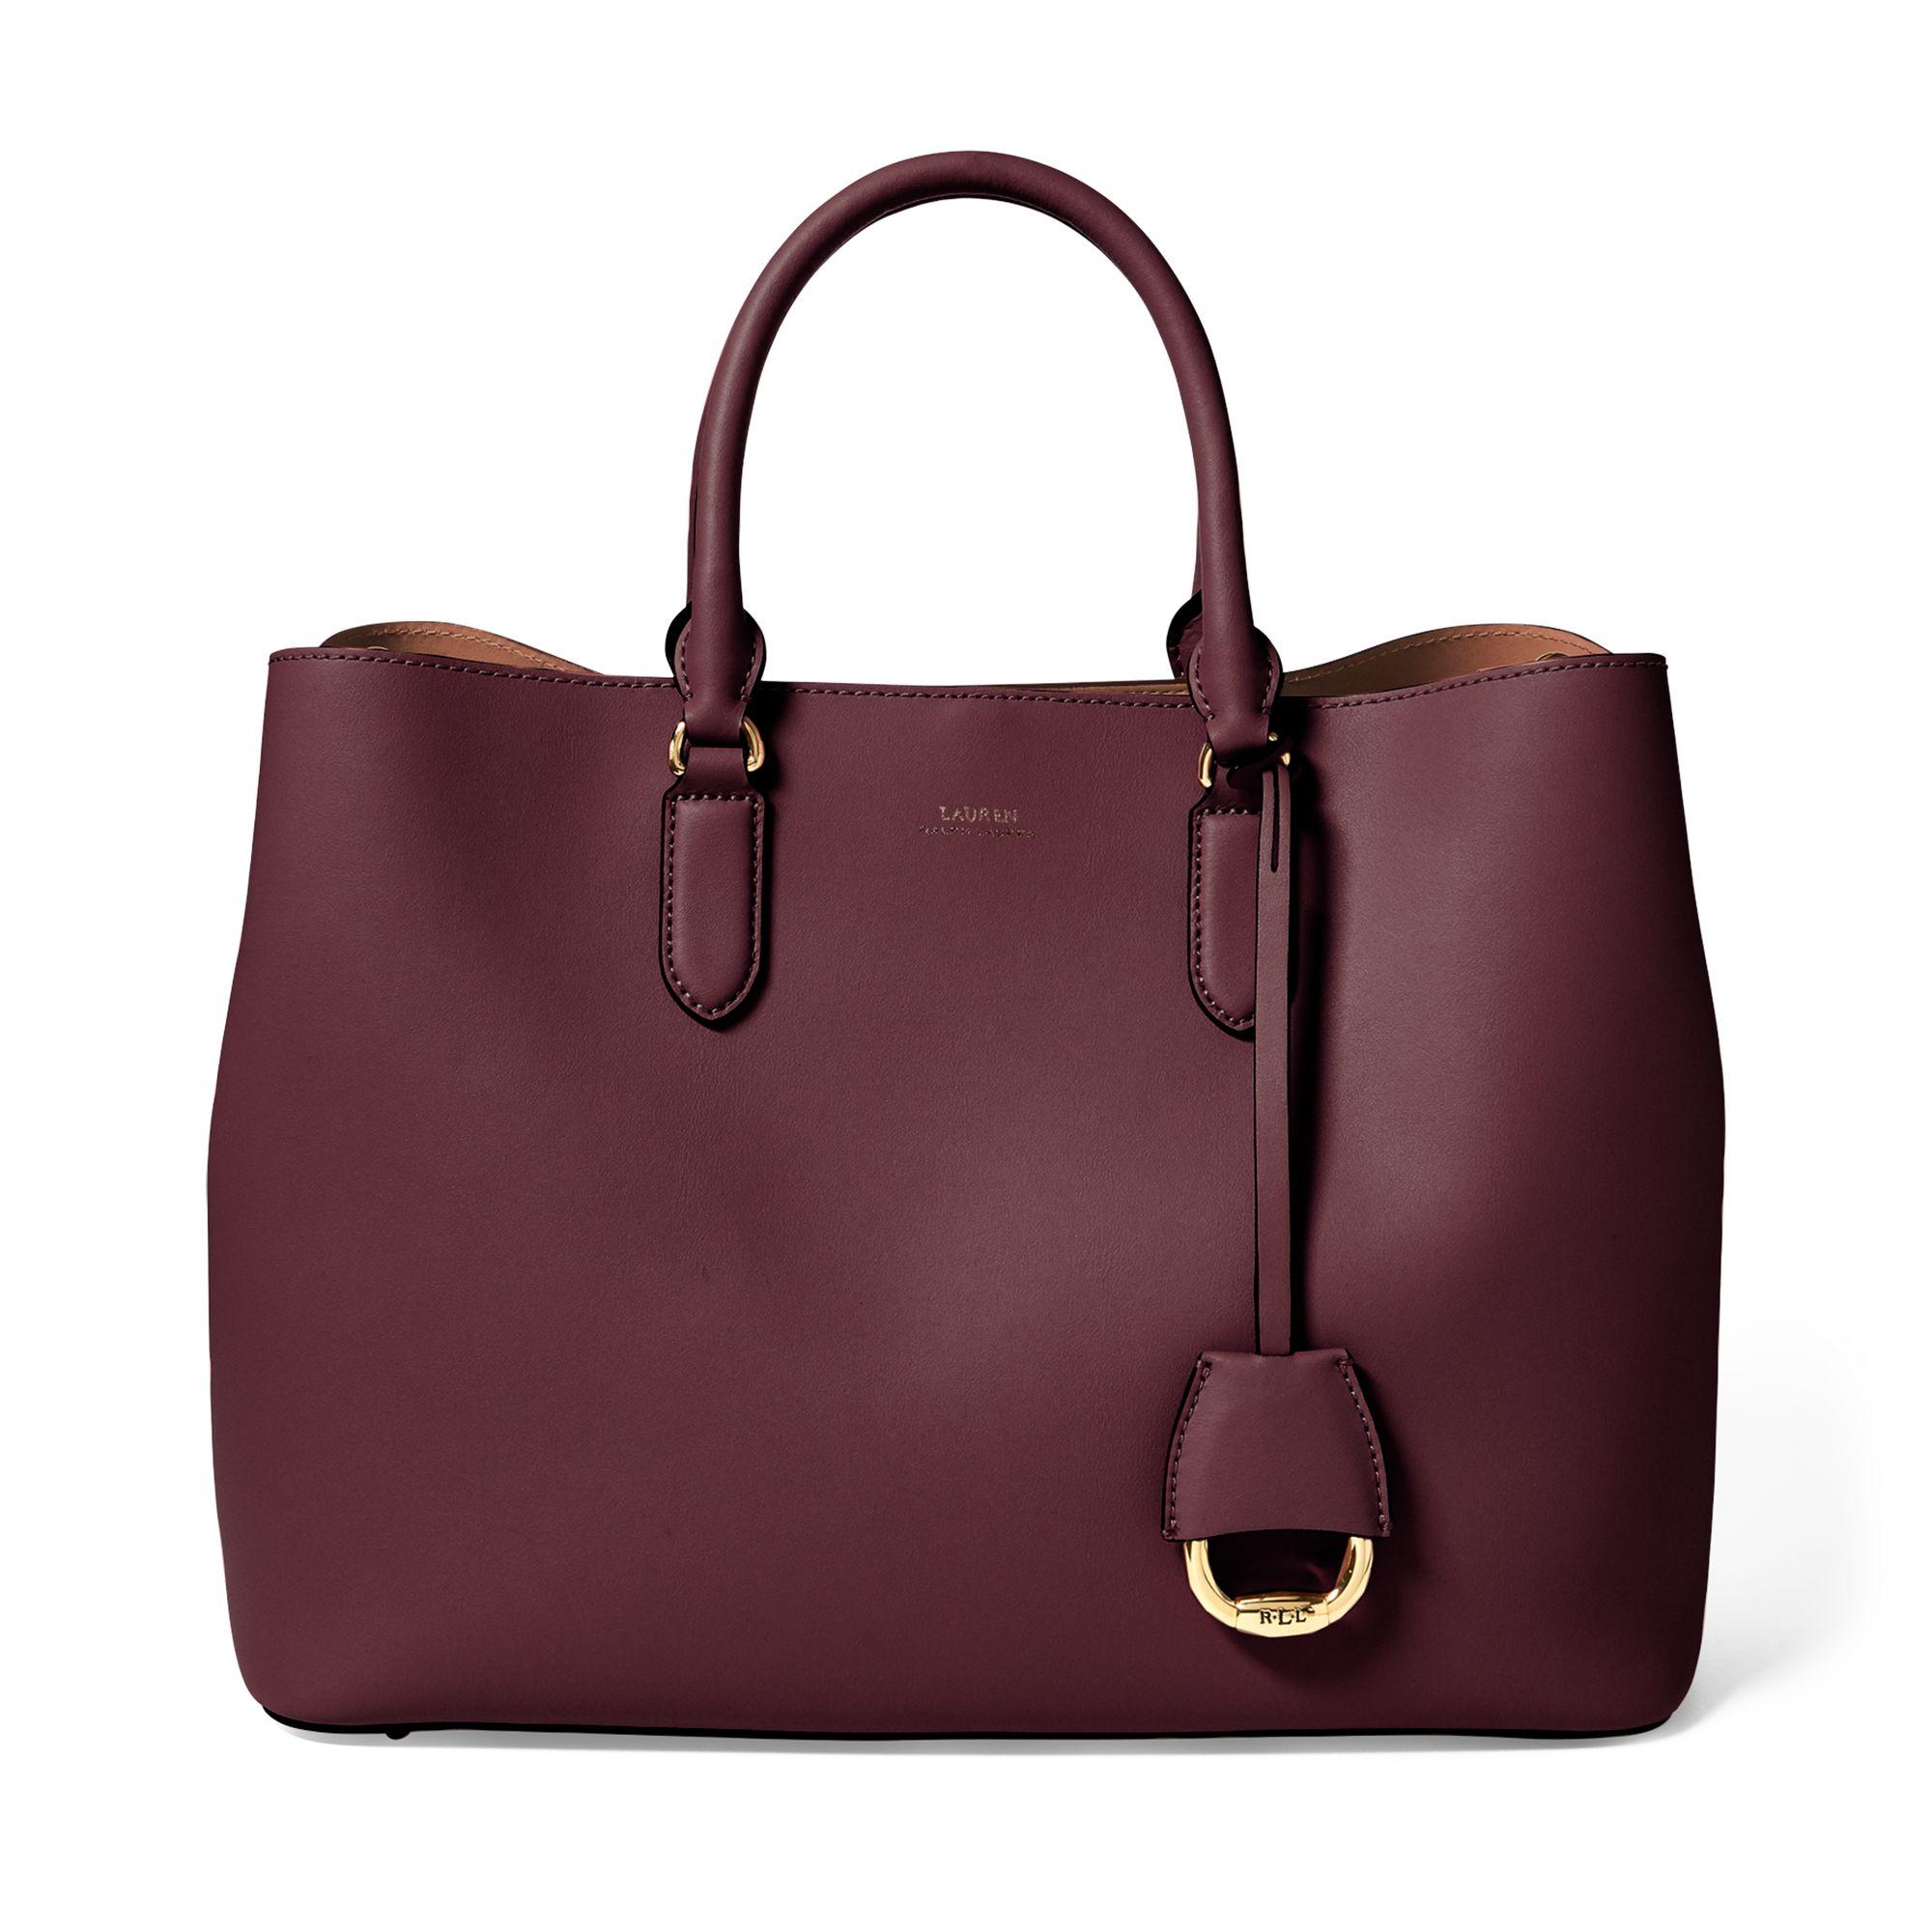 Lauren Ralph Lauren Dryden Marcy Satchel handväska i skinn, Mörkröd